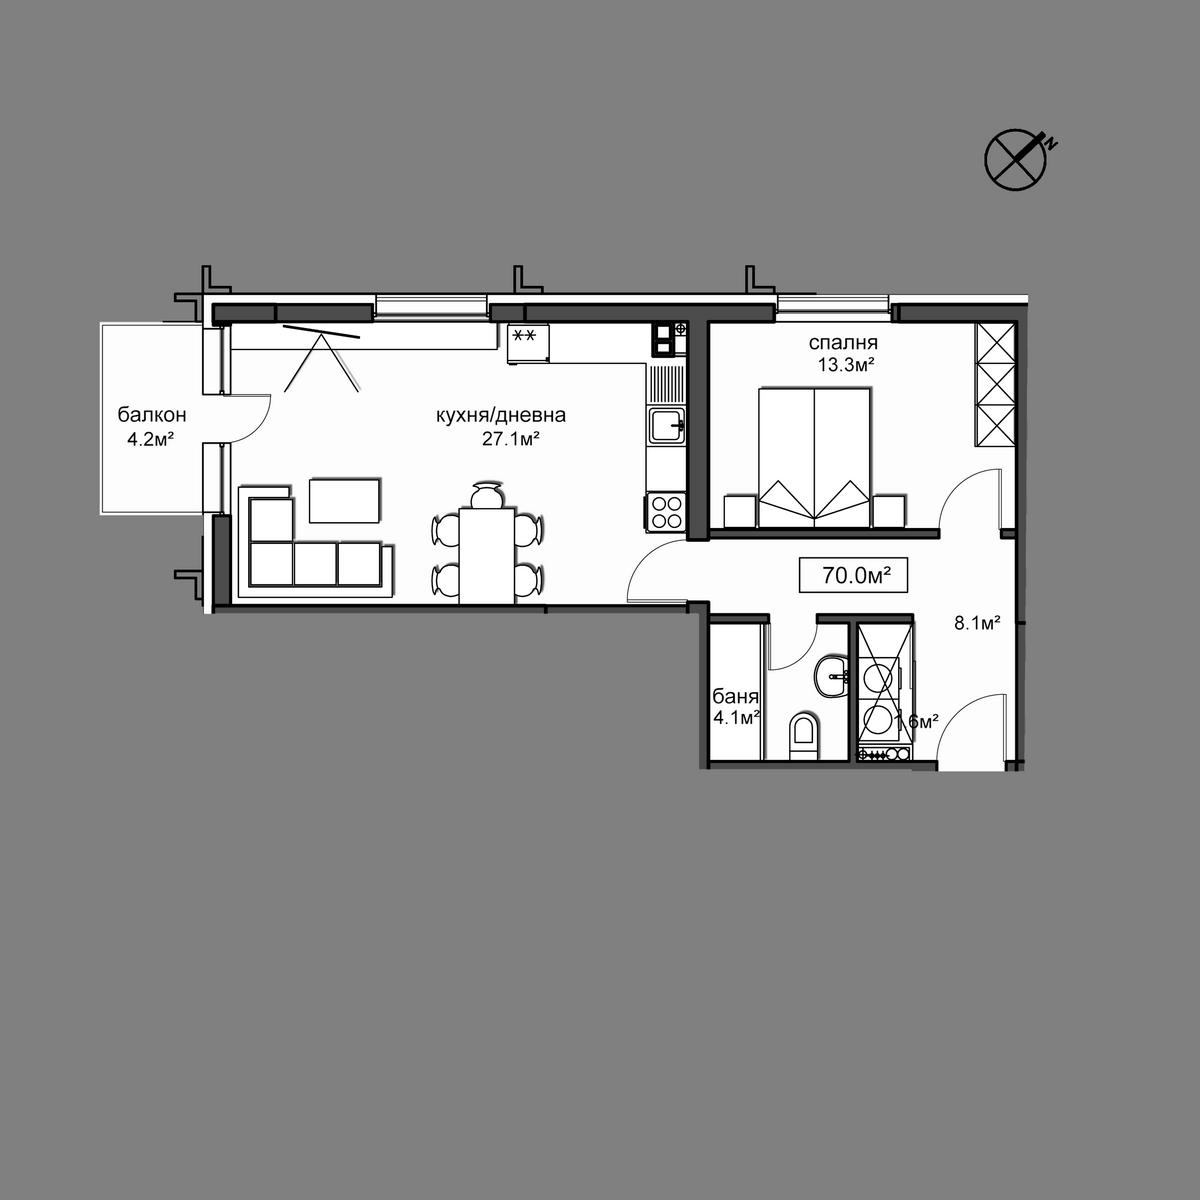 Продава апартамент - Апартамент 16